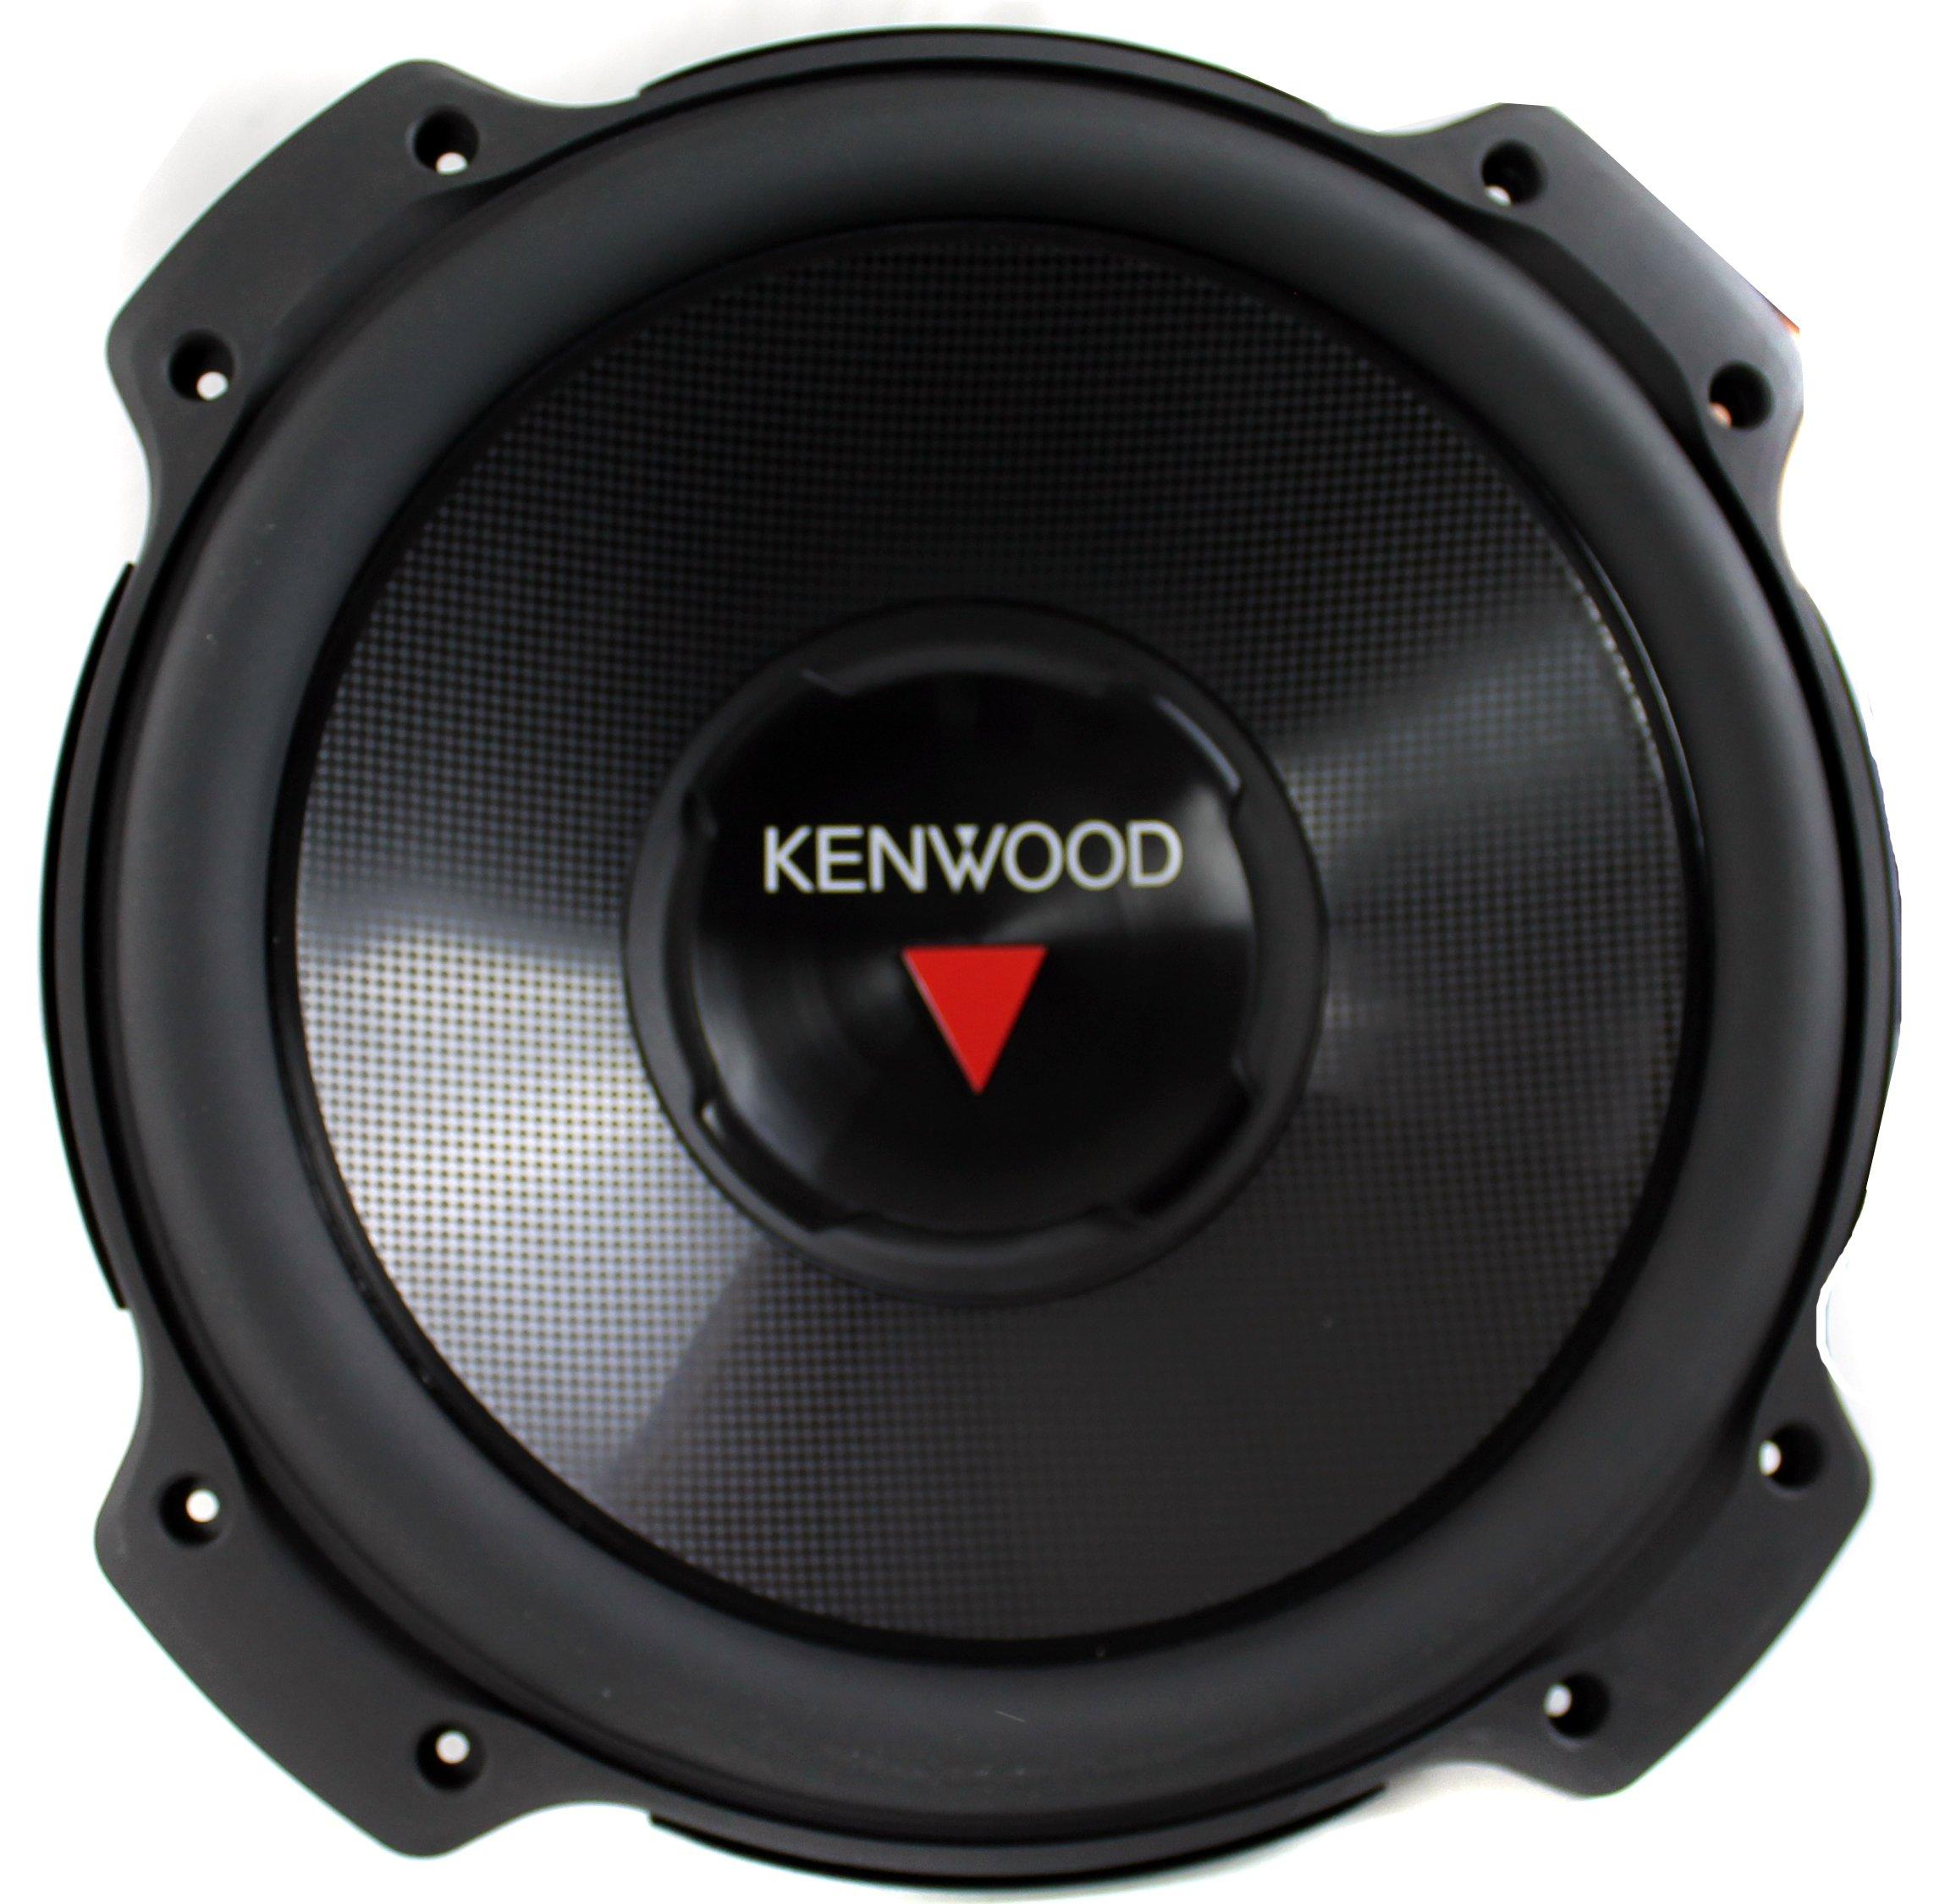 2) Kenwood KFC-W3016PS 12 Inch 2000W Subwoofers + Dodge Ram Quad Cab '02-New Box